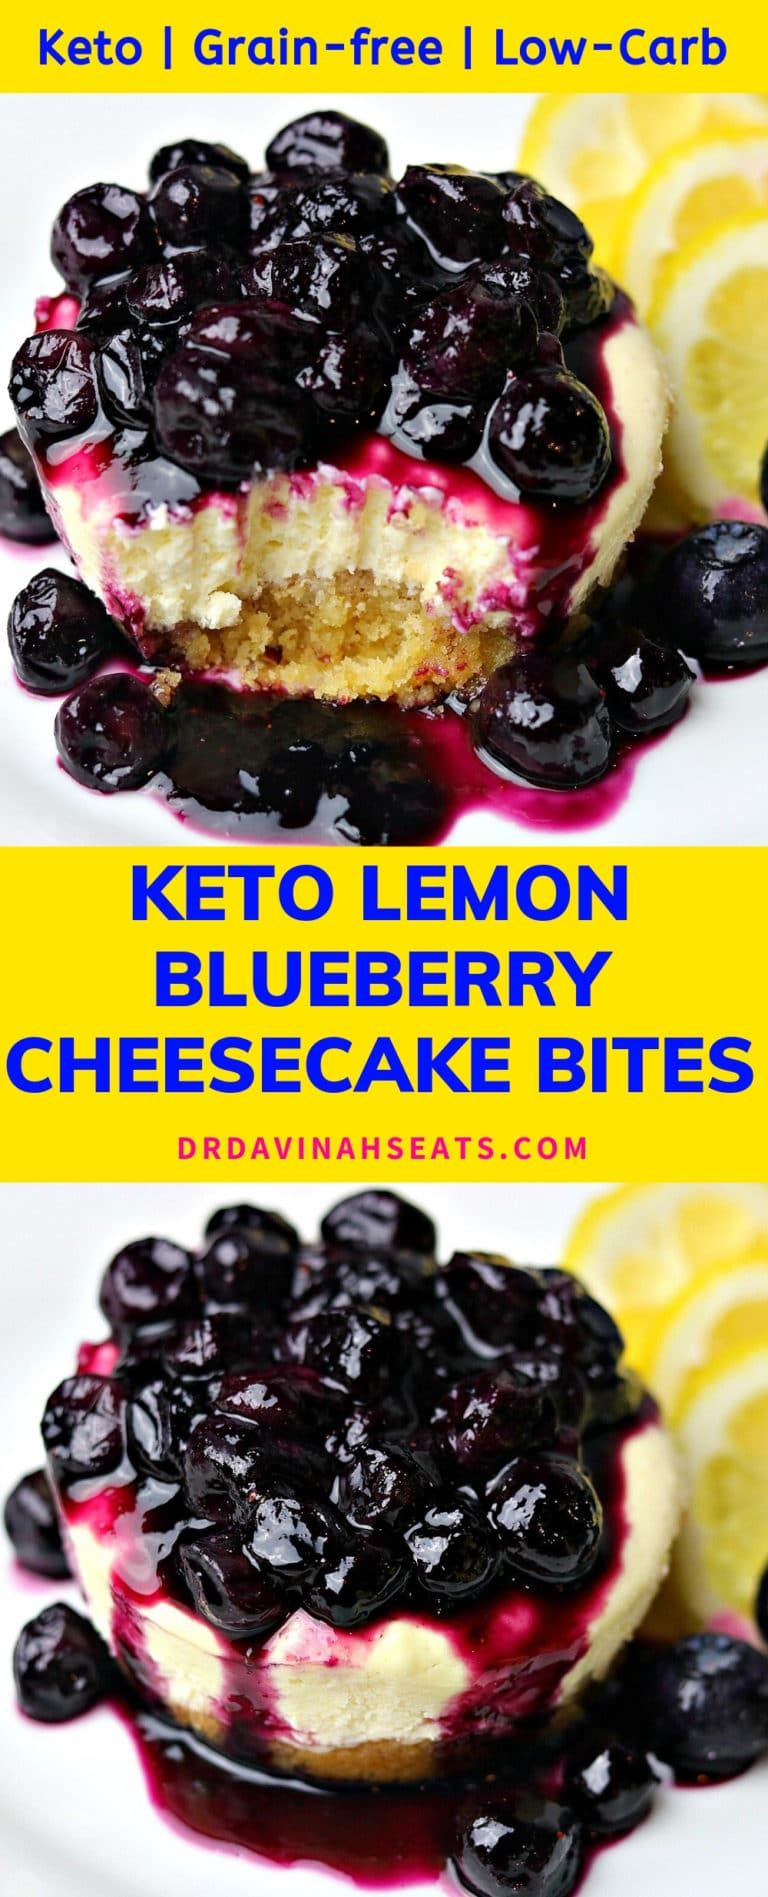 Keto & Low-Carb Lemon Blueberry Cheesecake Bites